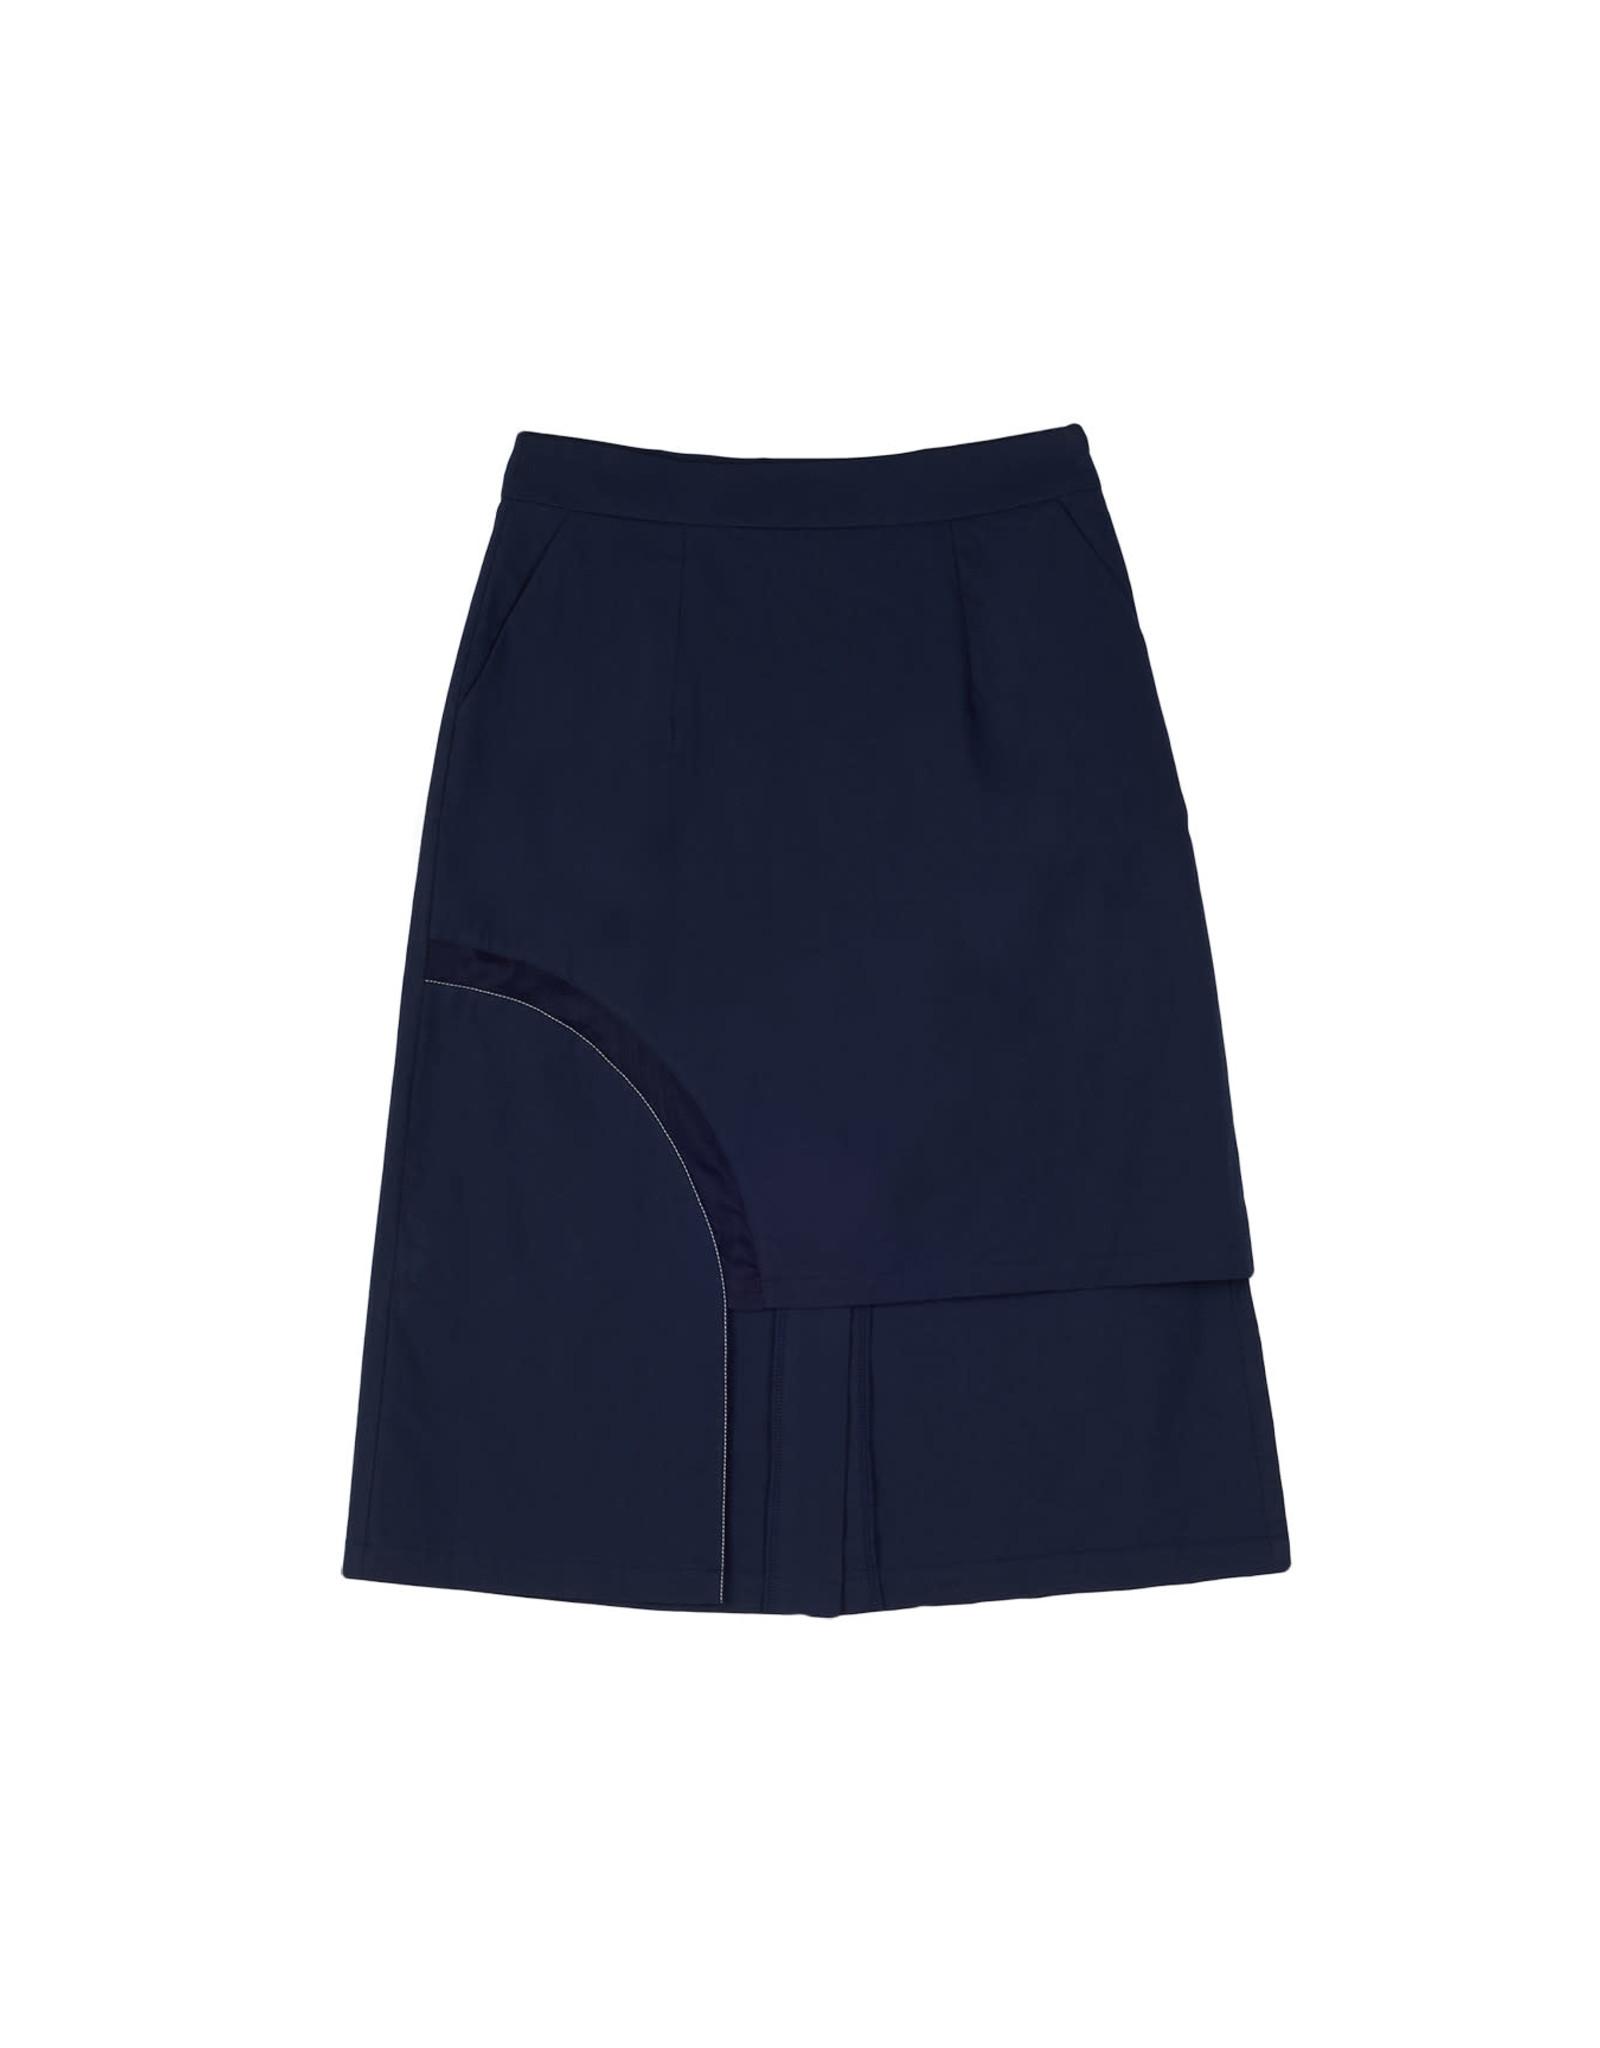 UR NAVY Silk Panel Midi Skirt Navy